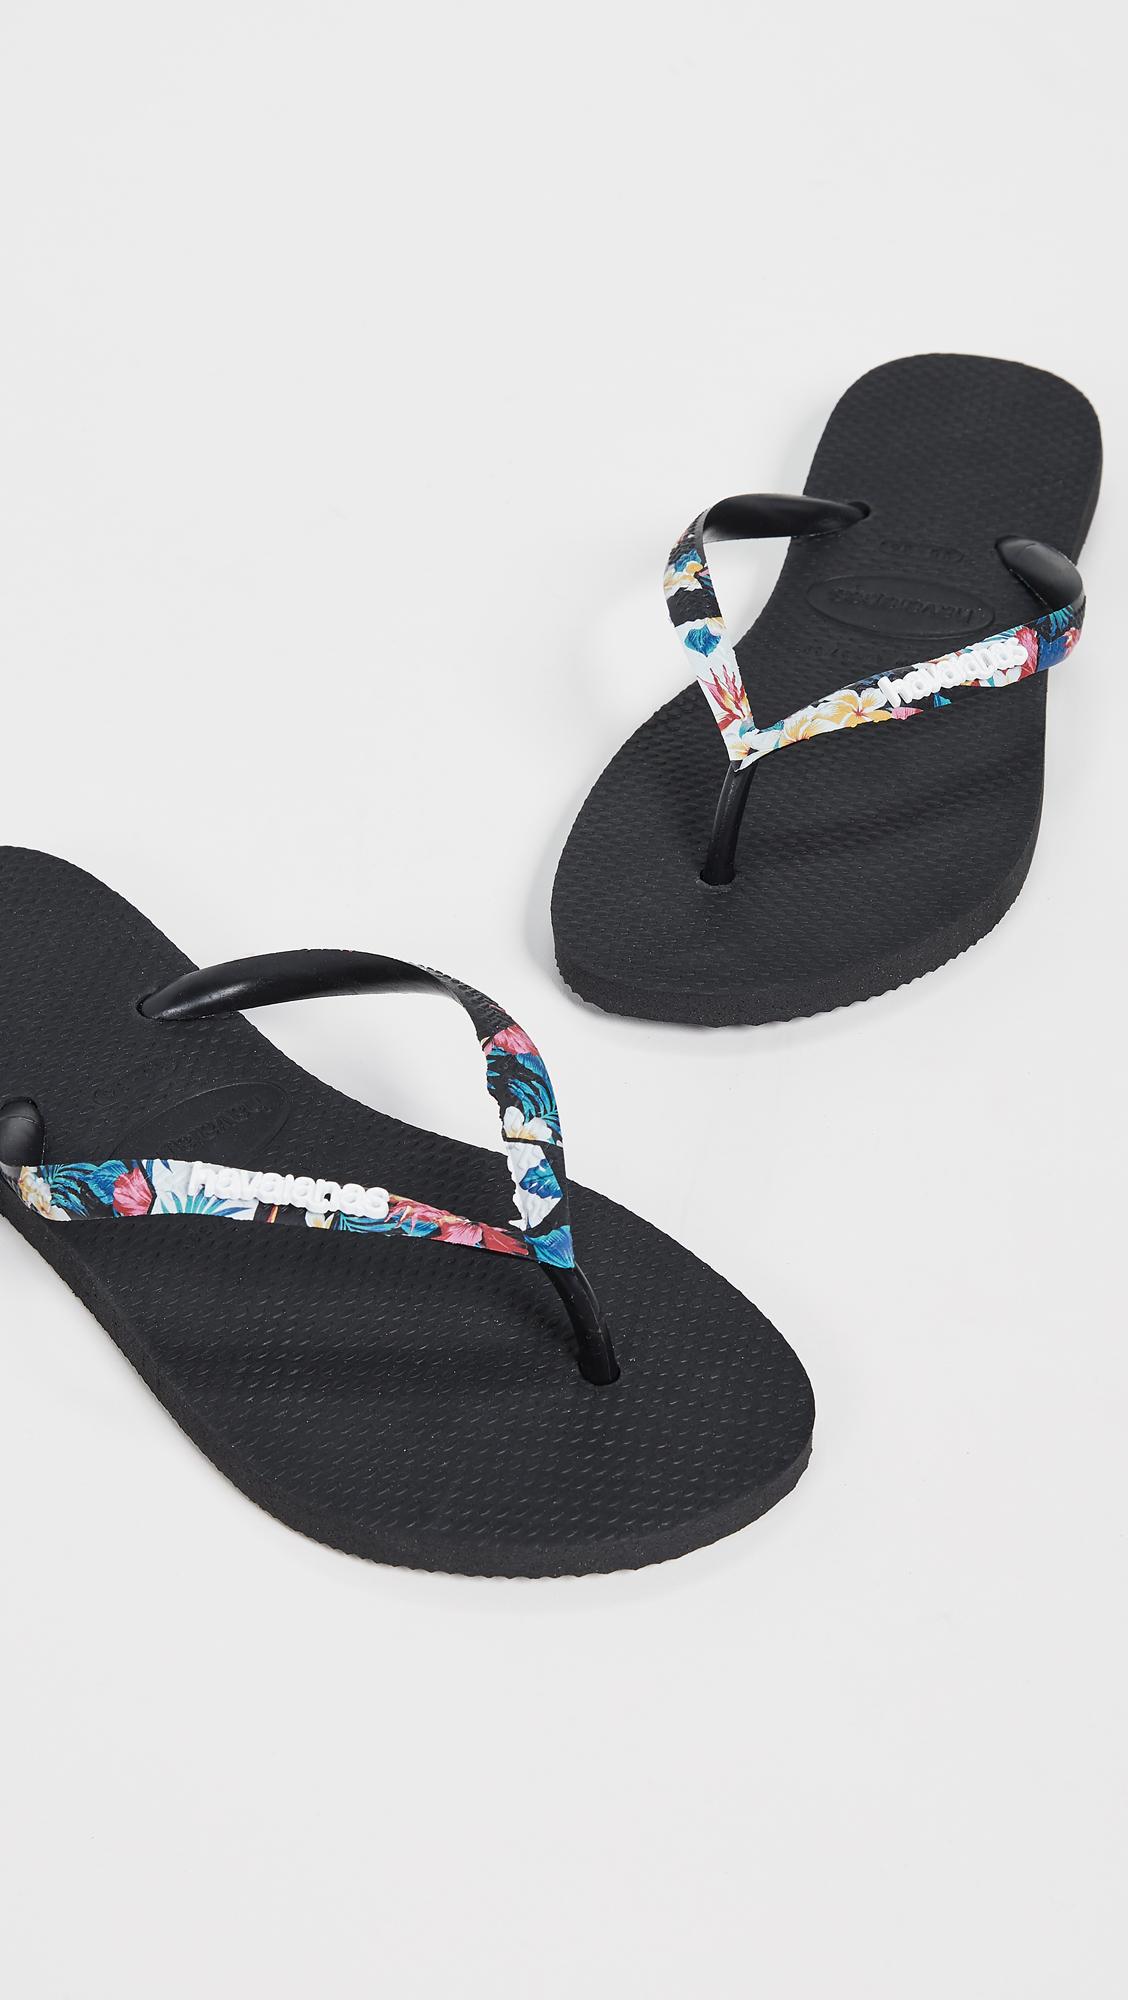 85866bd845731 Havaianas Slim Tropical Strap Flip Flops